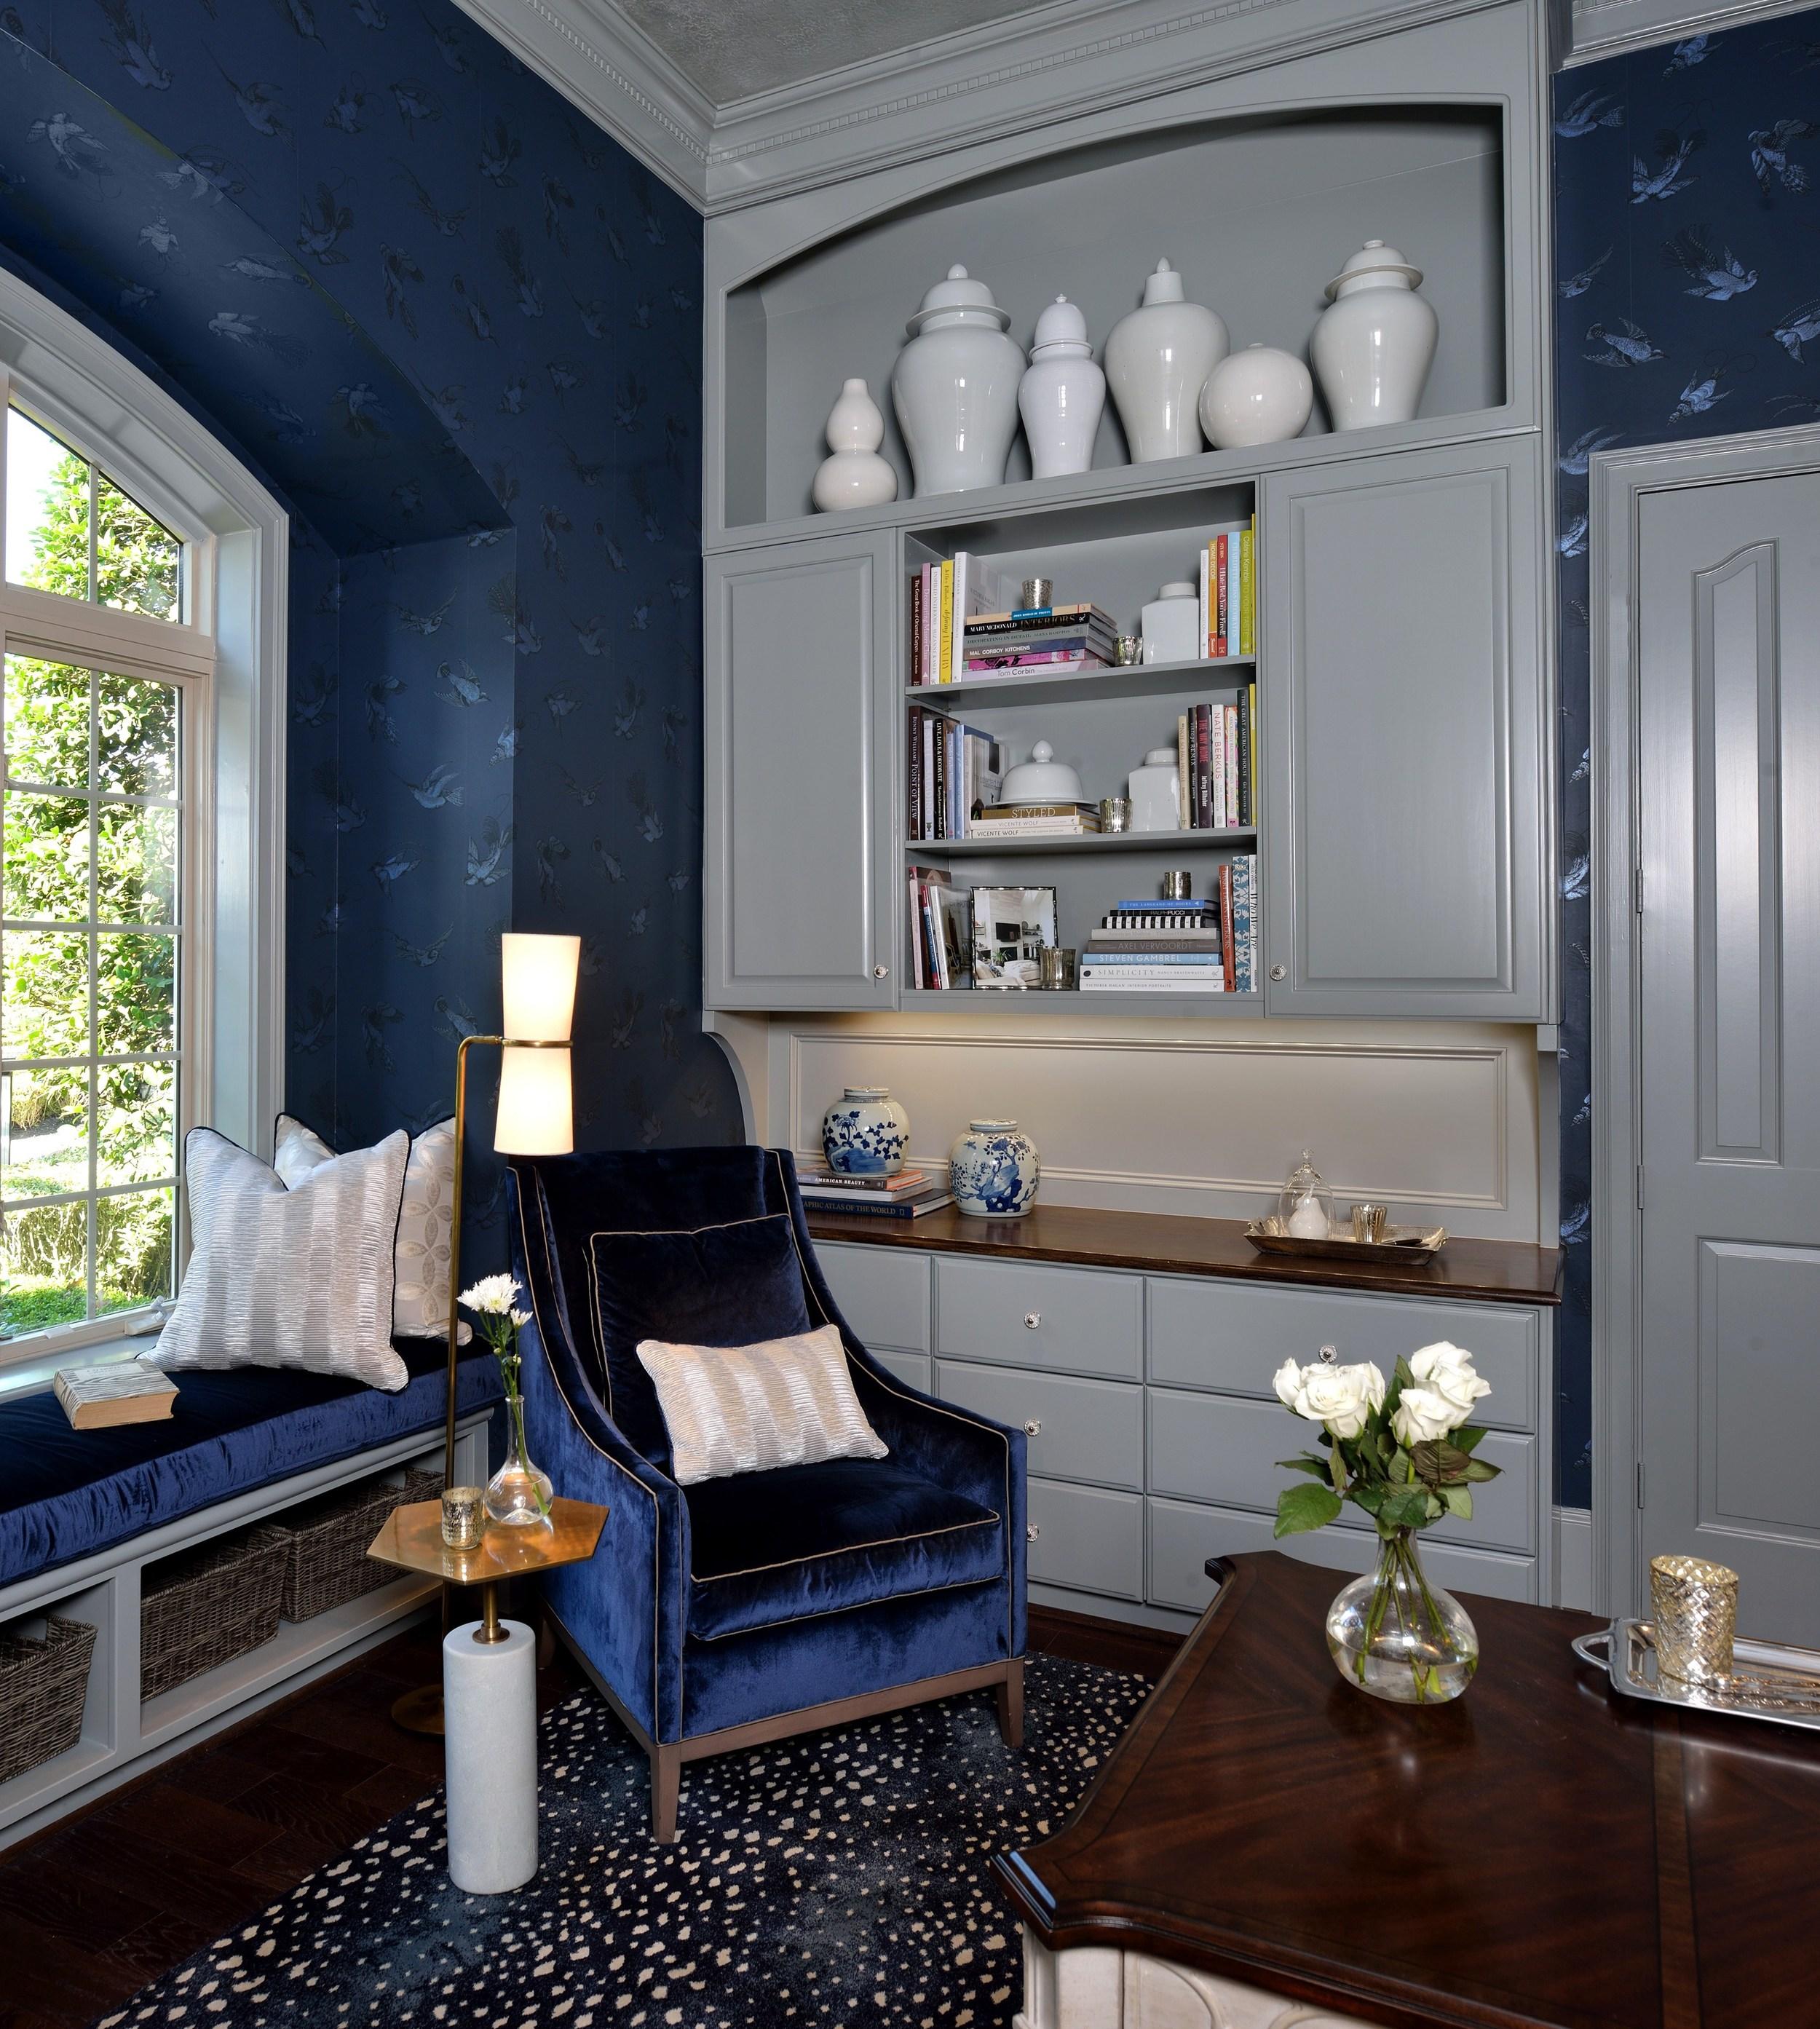 Bookshelf styling in home office   Holiday Showhouse 2015 Room, Miro Dvorscak, photographer